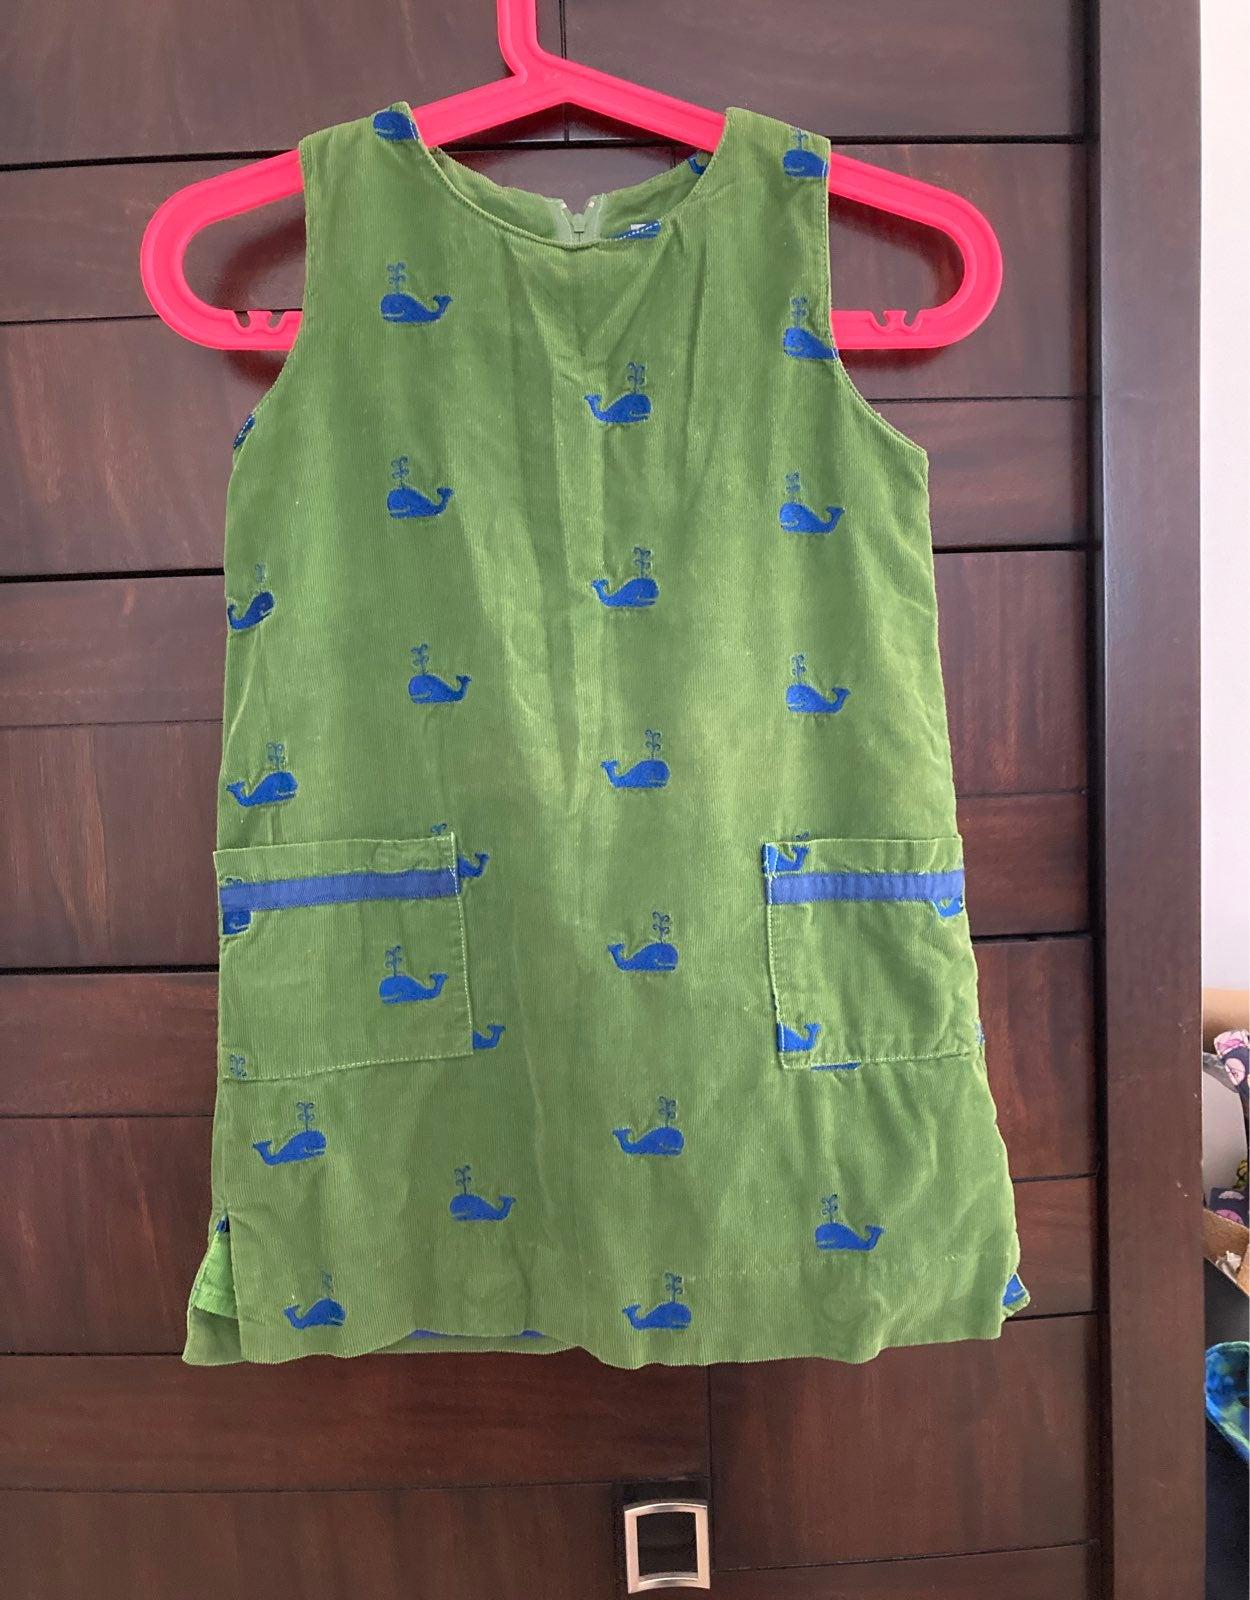 Lilly Pulitzer Girl's dress size 6X